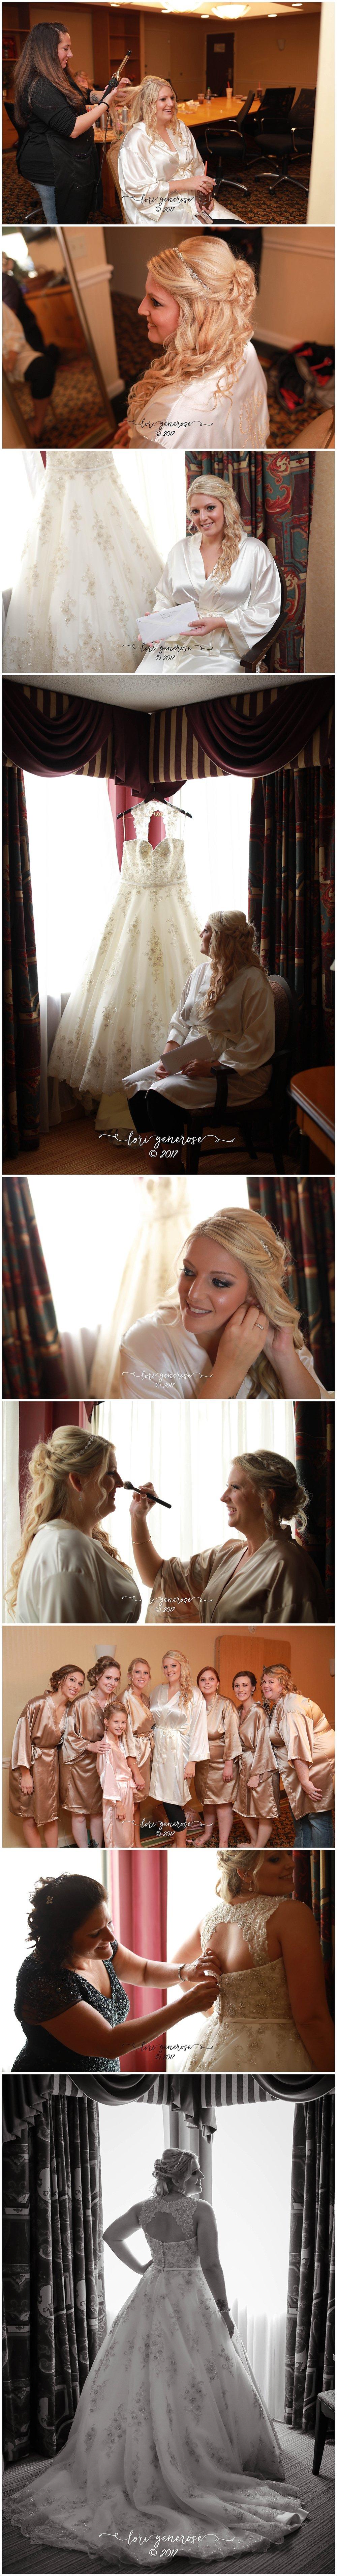 weddingbridegettingreadyhairmakeupdress.jpg